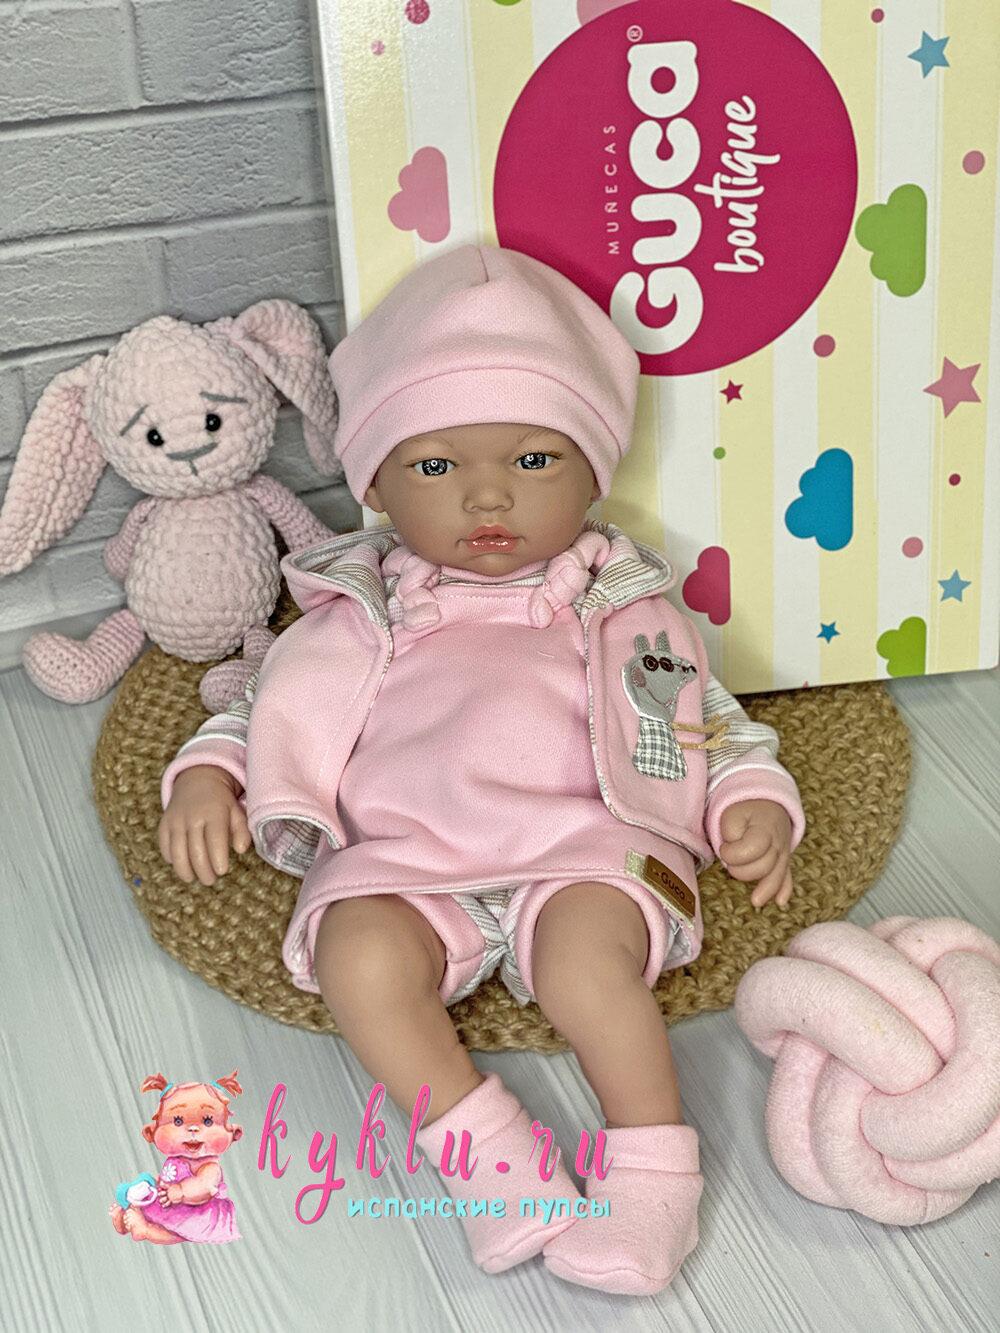 Кукла Celine от фабрики Guca